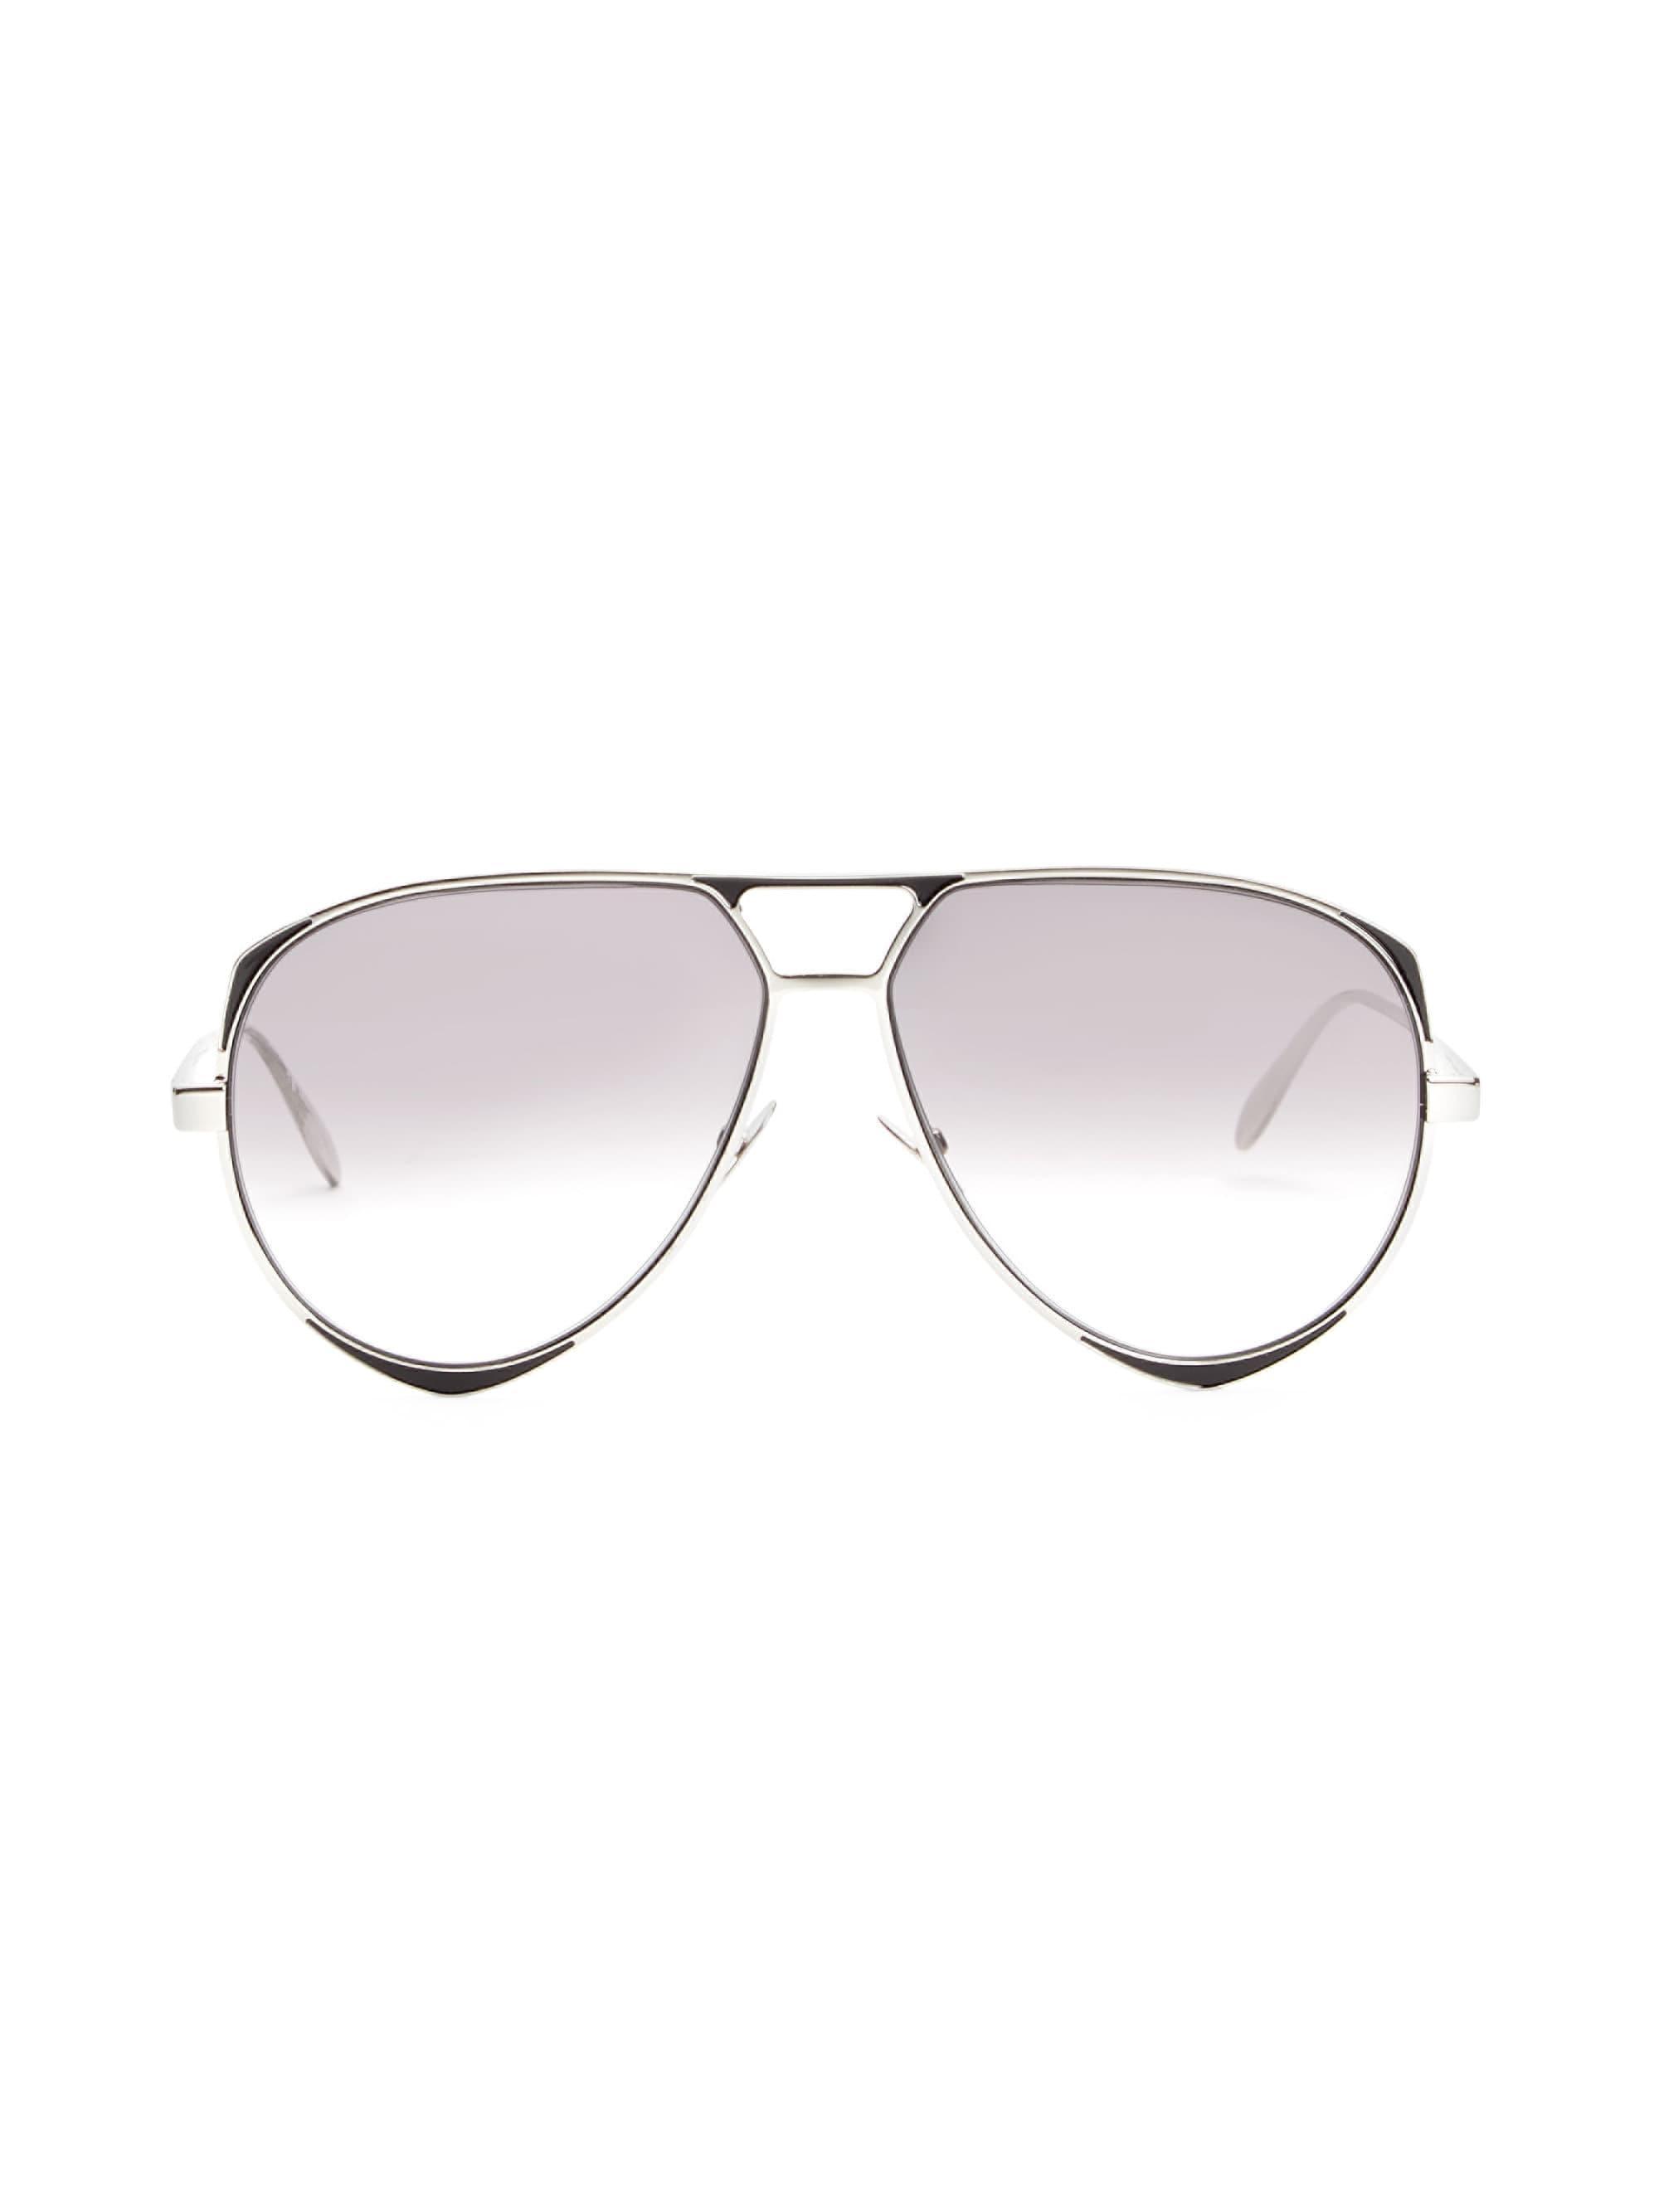 c7a4039e863 Alexander McQueen 61mm Geometric Aviator Sunglasses in Metallic for ...